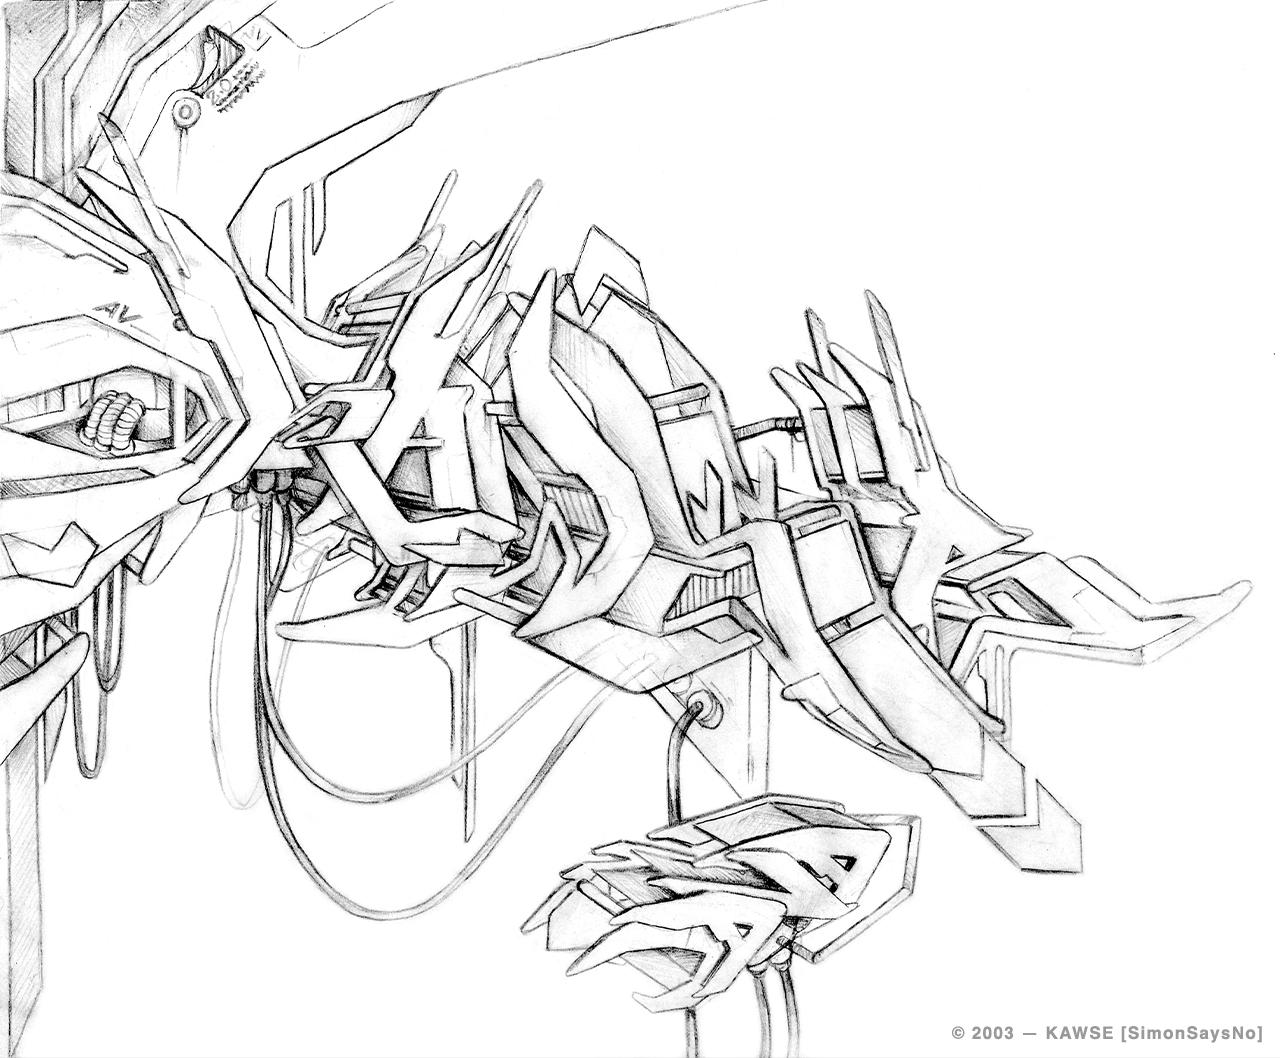 KAWSE 2003  — FUTURISTIC MODULE  [Sketch]